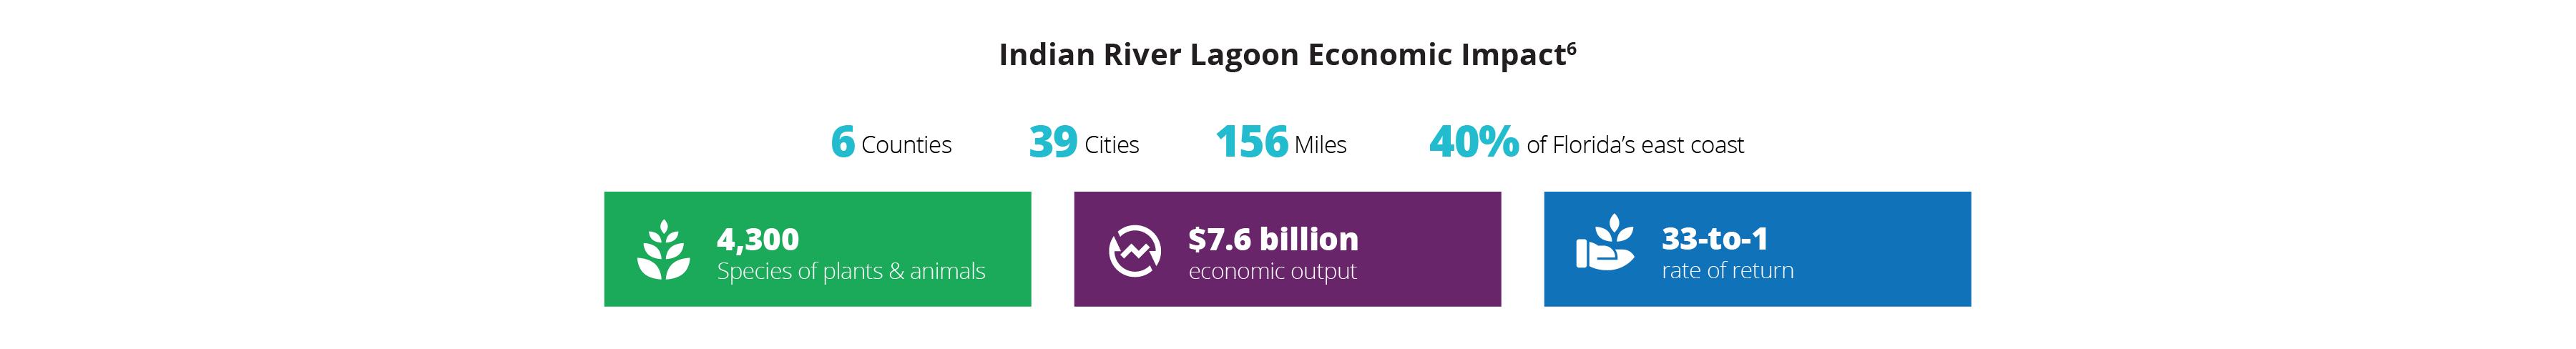 Indian River Lagoon economic impact